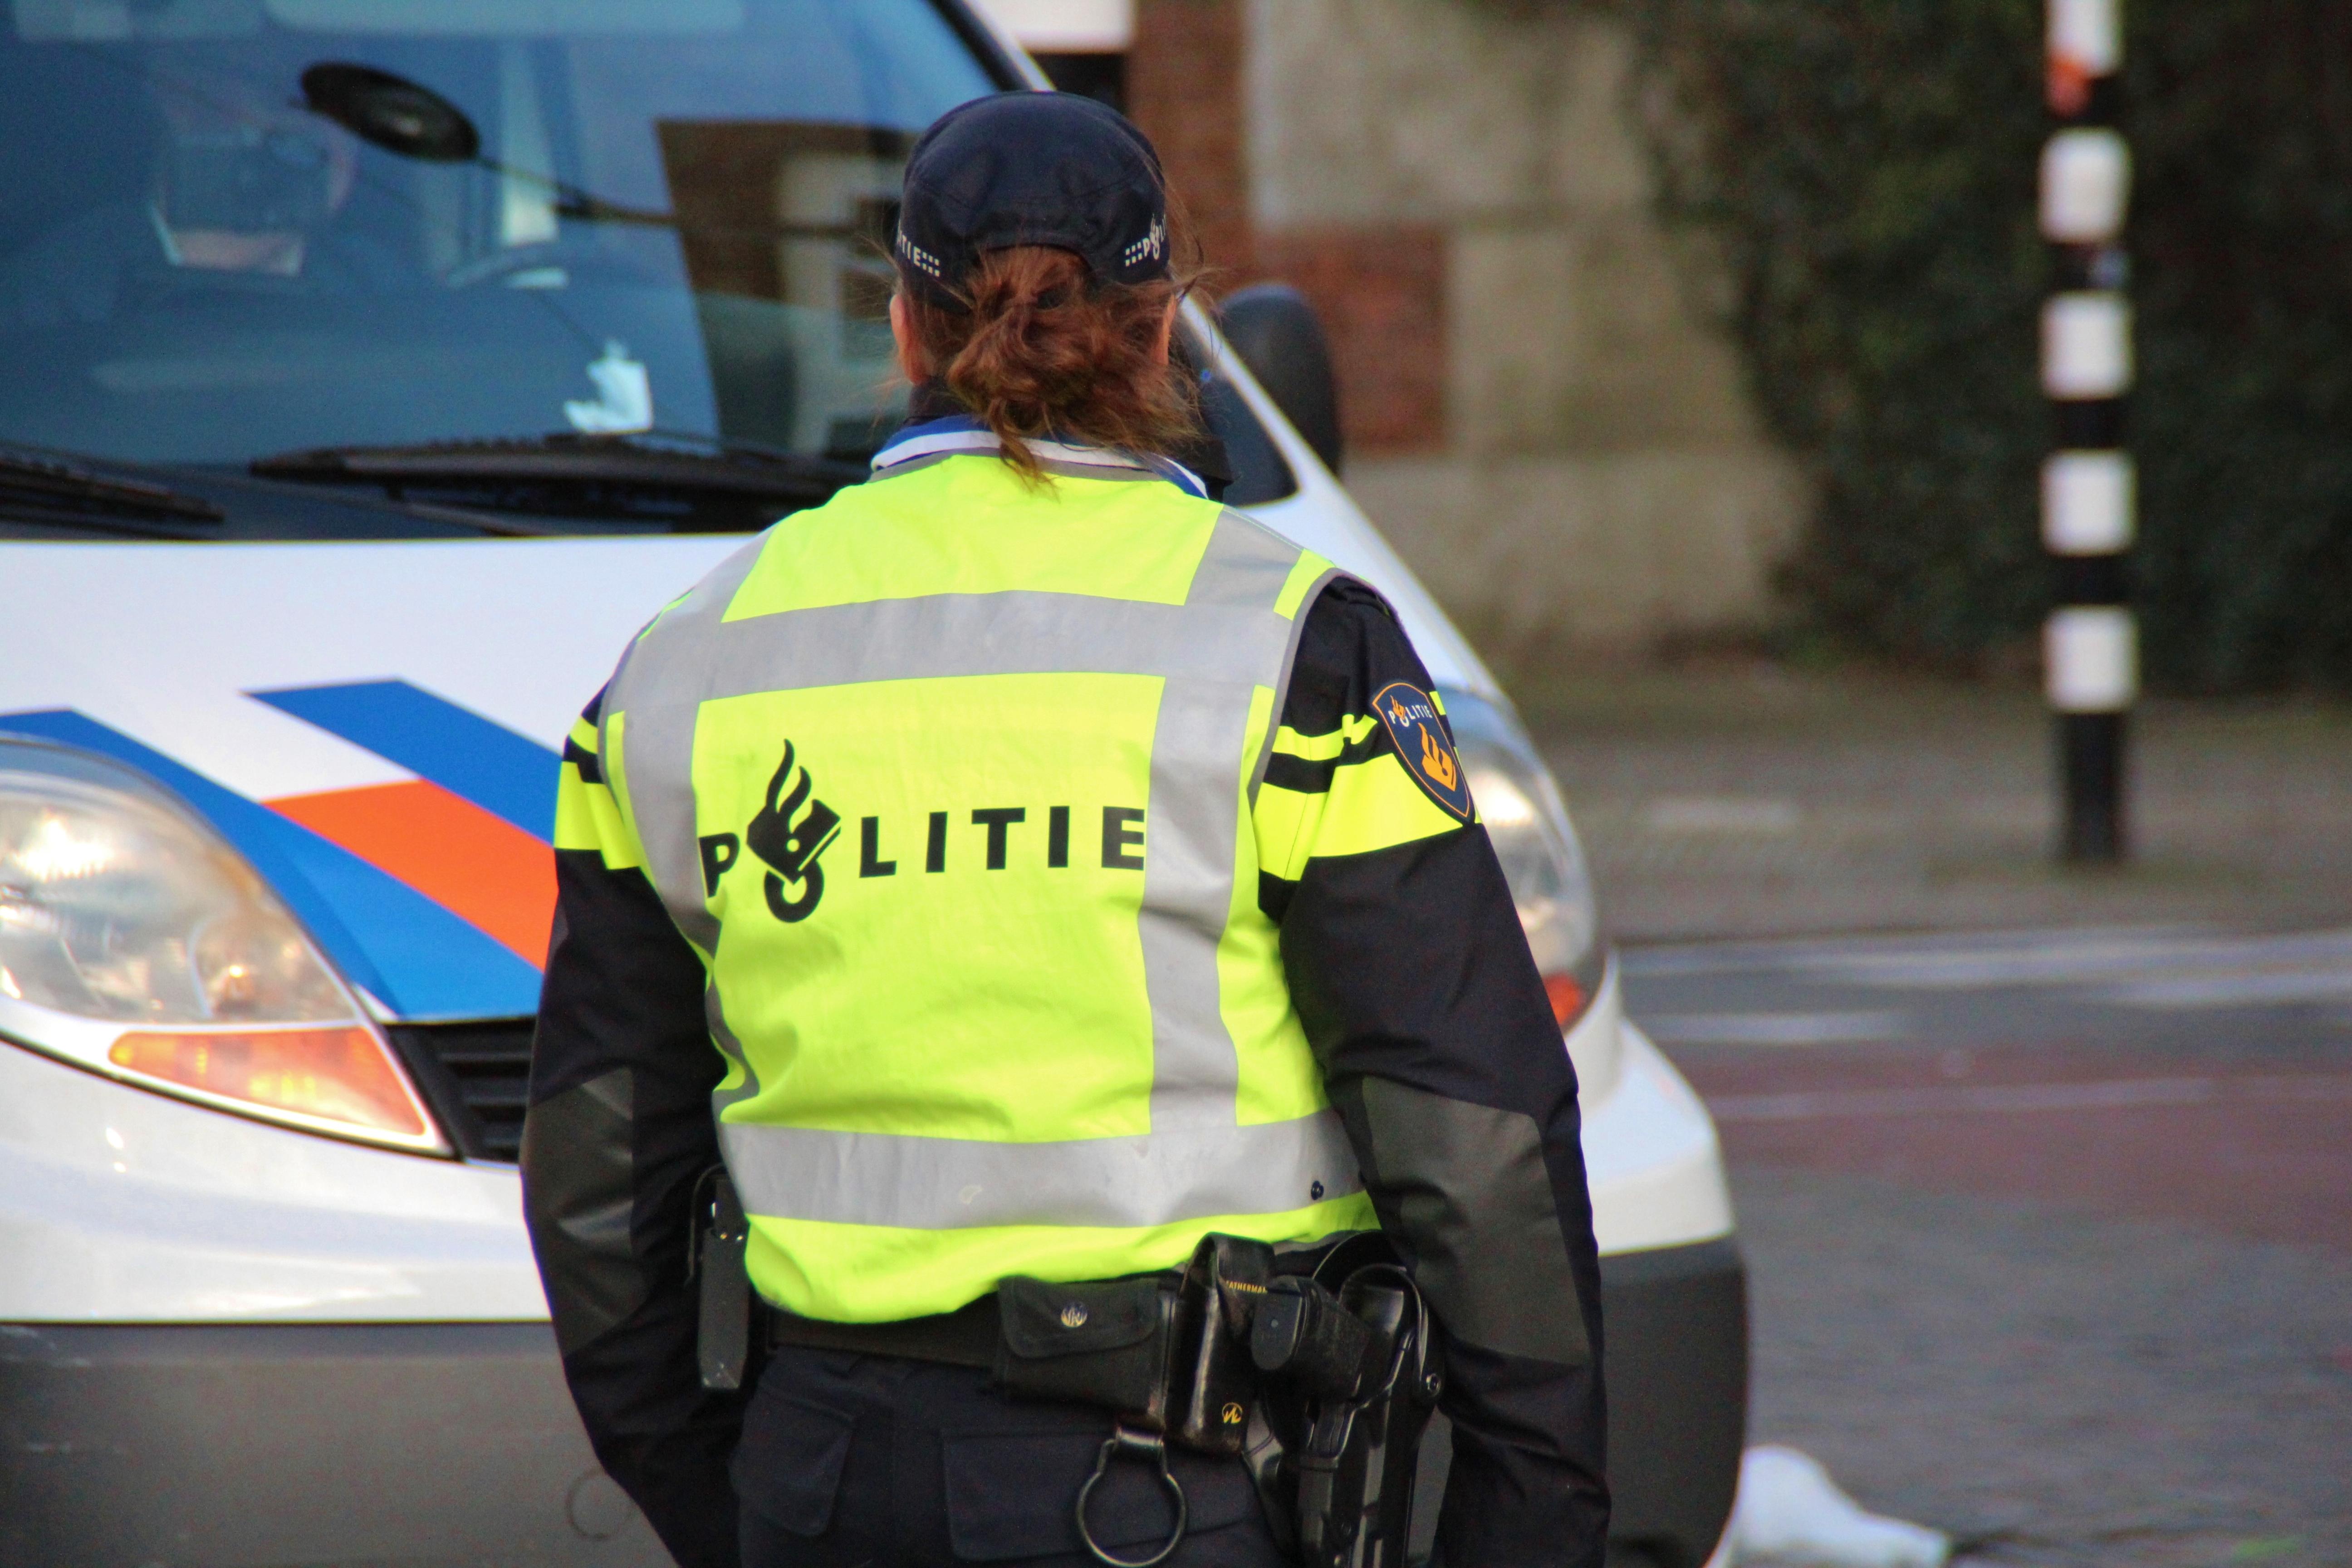 Politie pakt overvaller vlak na overval